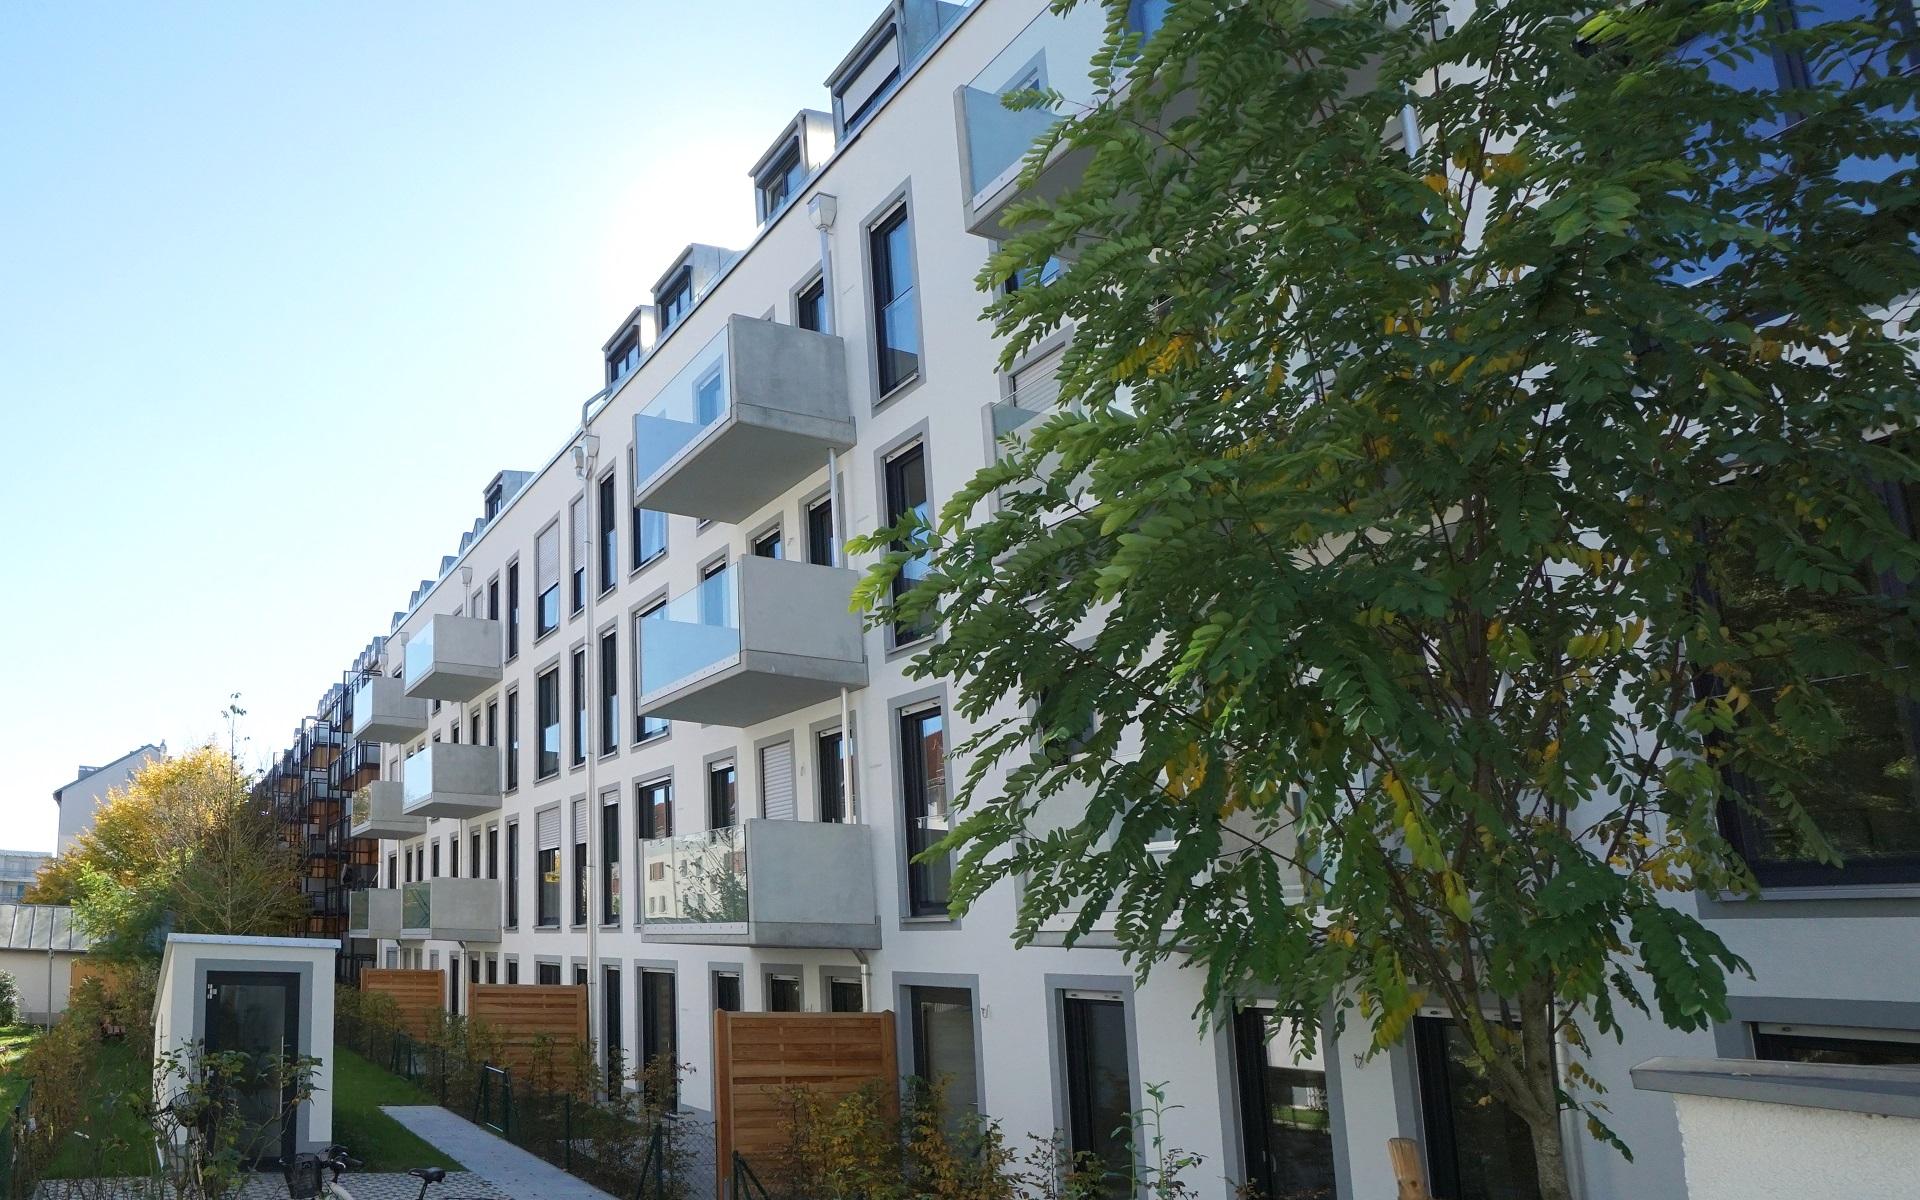 LHOMES_Neubau_Belgradstr_Garten_1920x1200